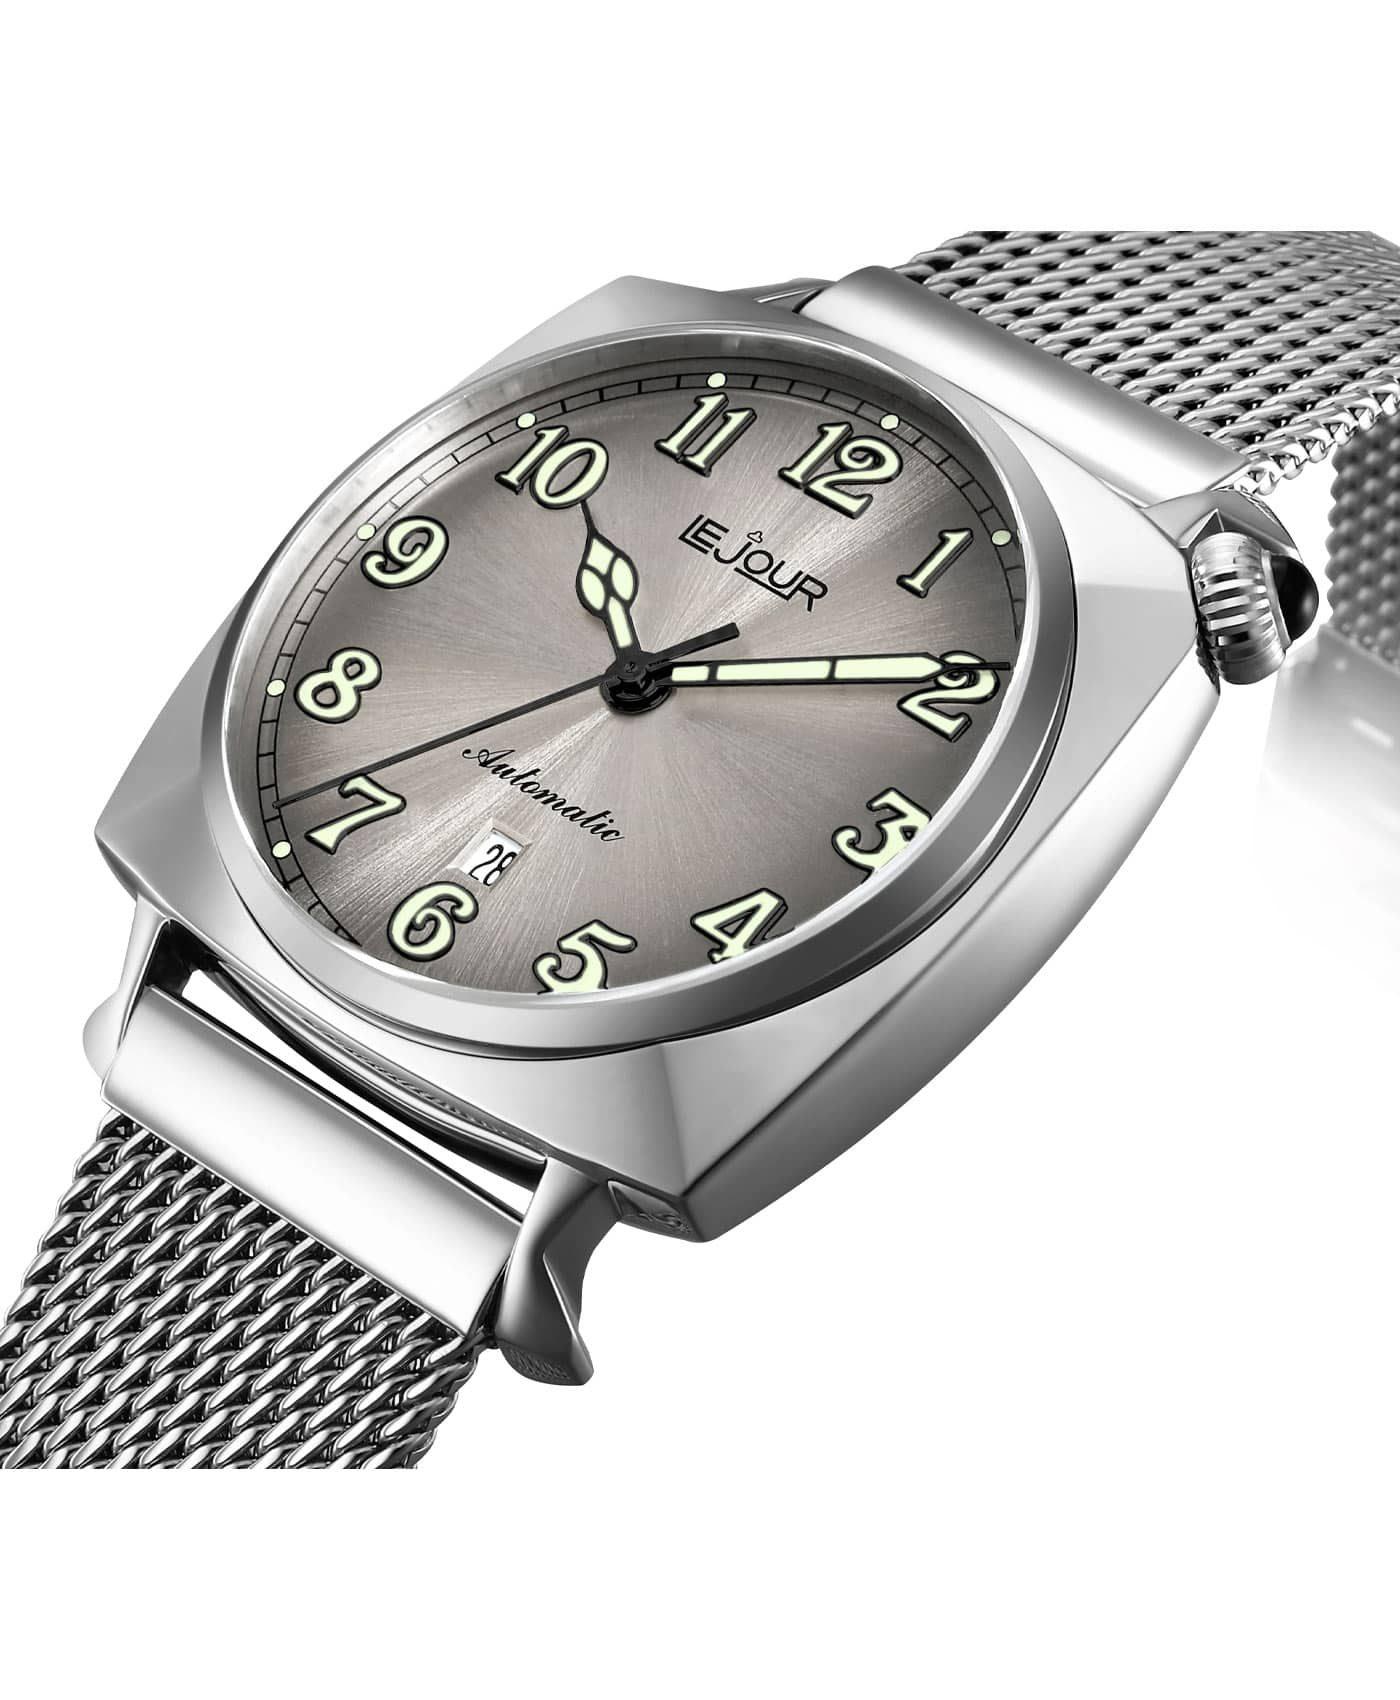 LJ-HR-003 silver sunray dial pillow case